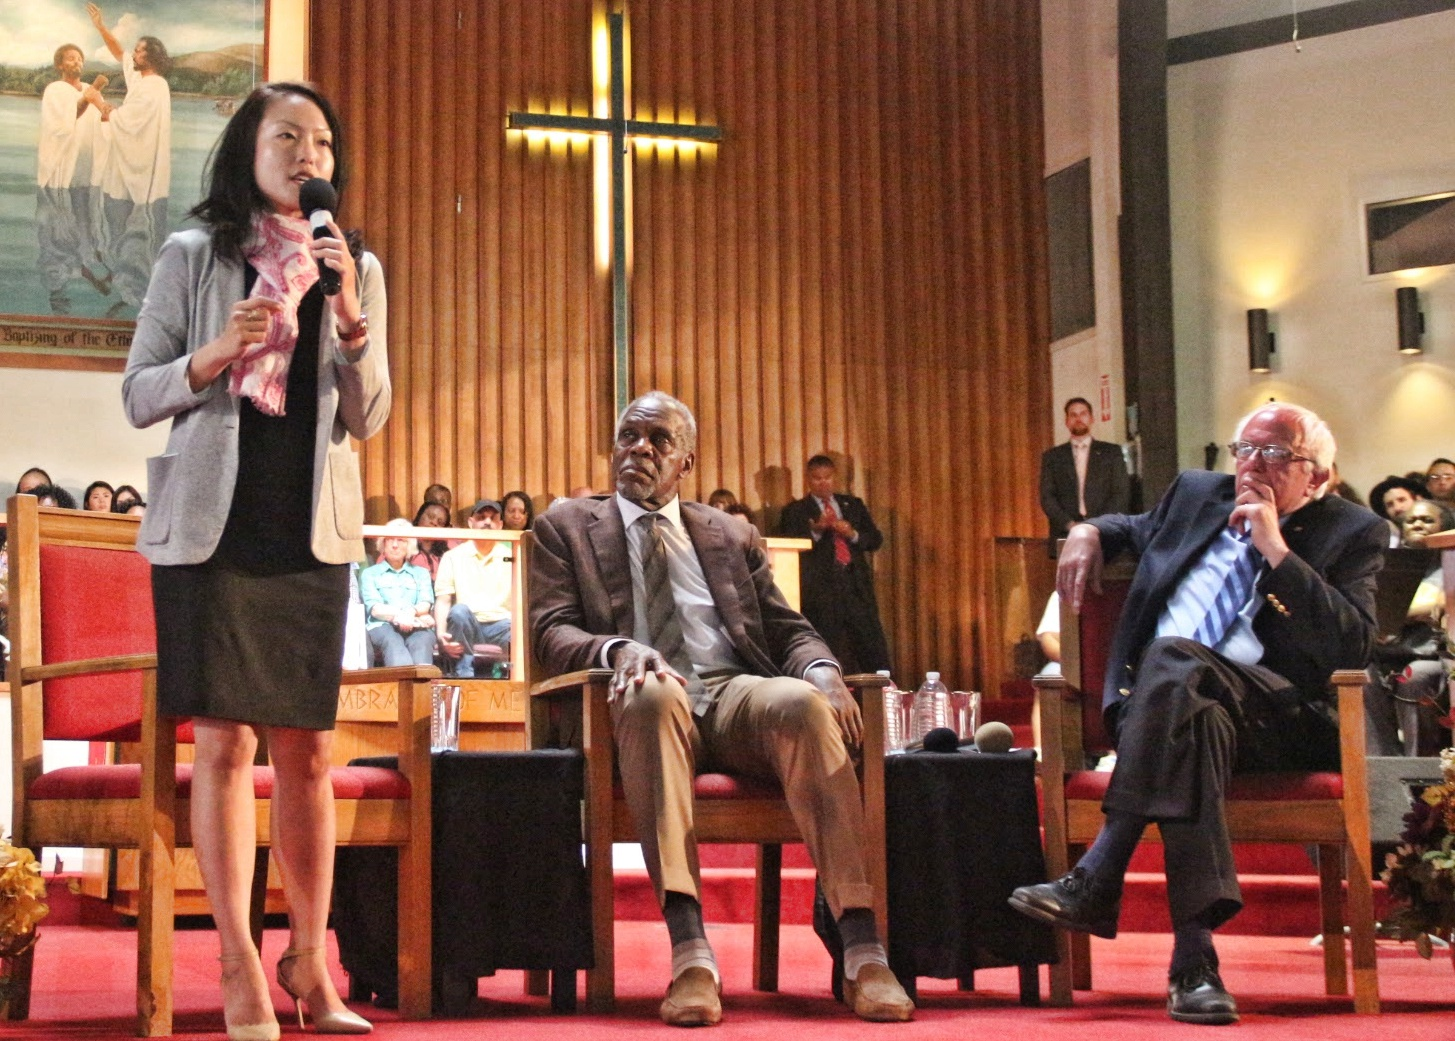 Sup Jane Kim, Danny Glover and Senator Bernie Sanders up on stage at the Allen Temple Baptist Church. Photo by Sana Saleem.